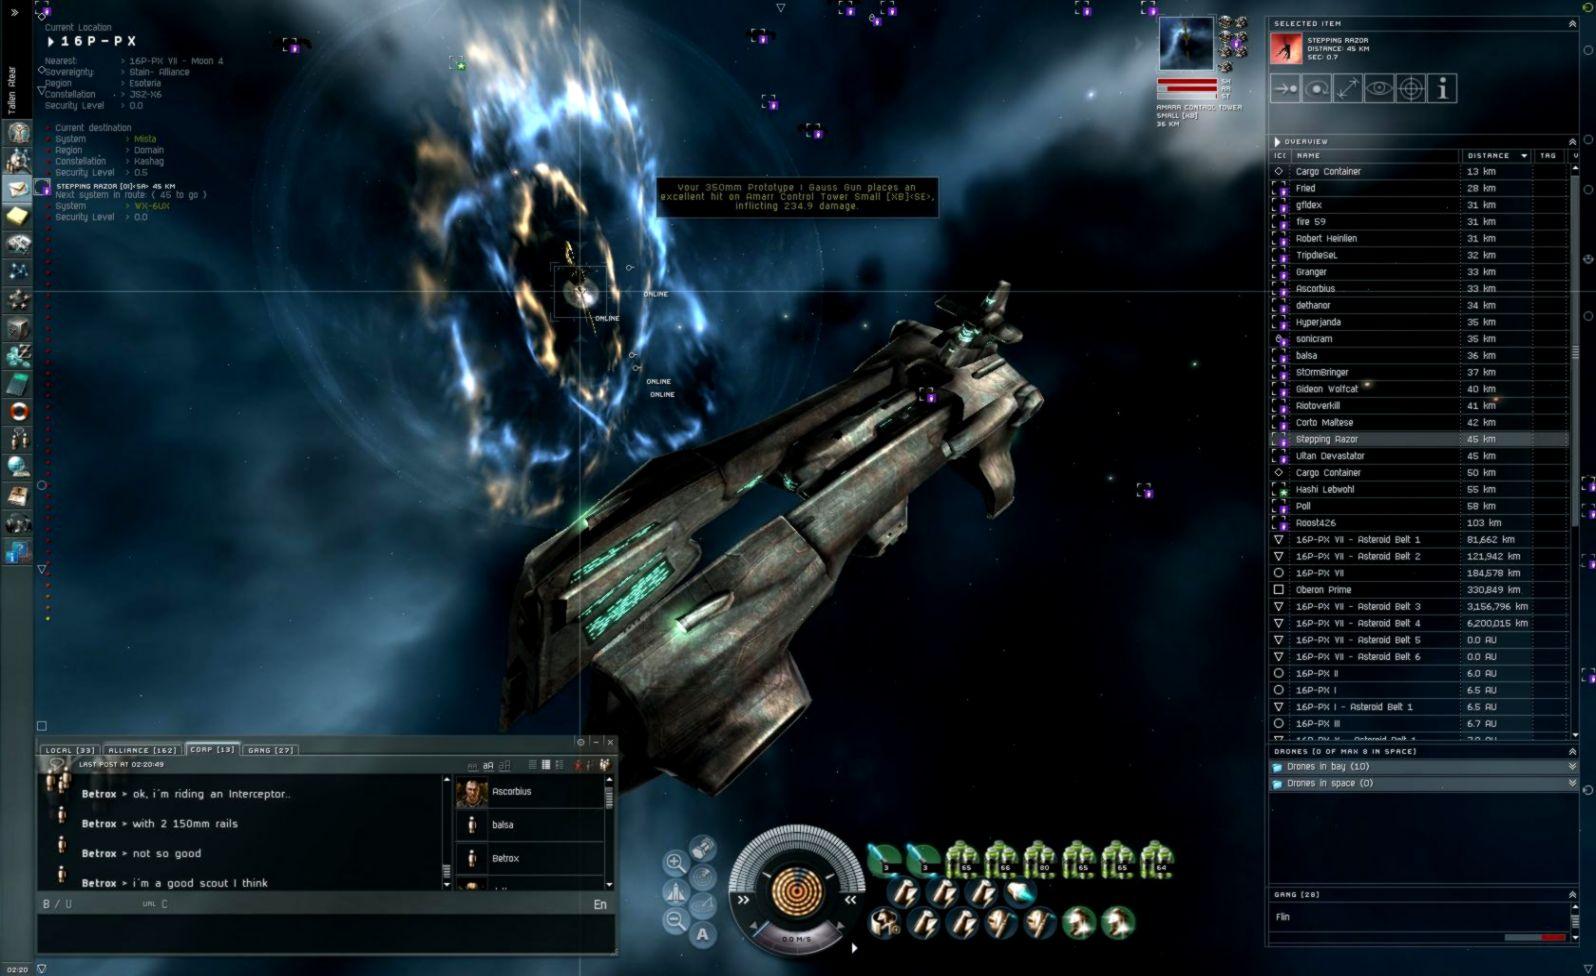 Eve Online Gameplay Screen | Opera Wallpapers